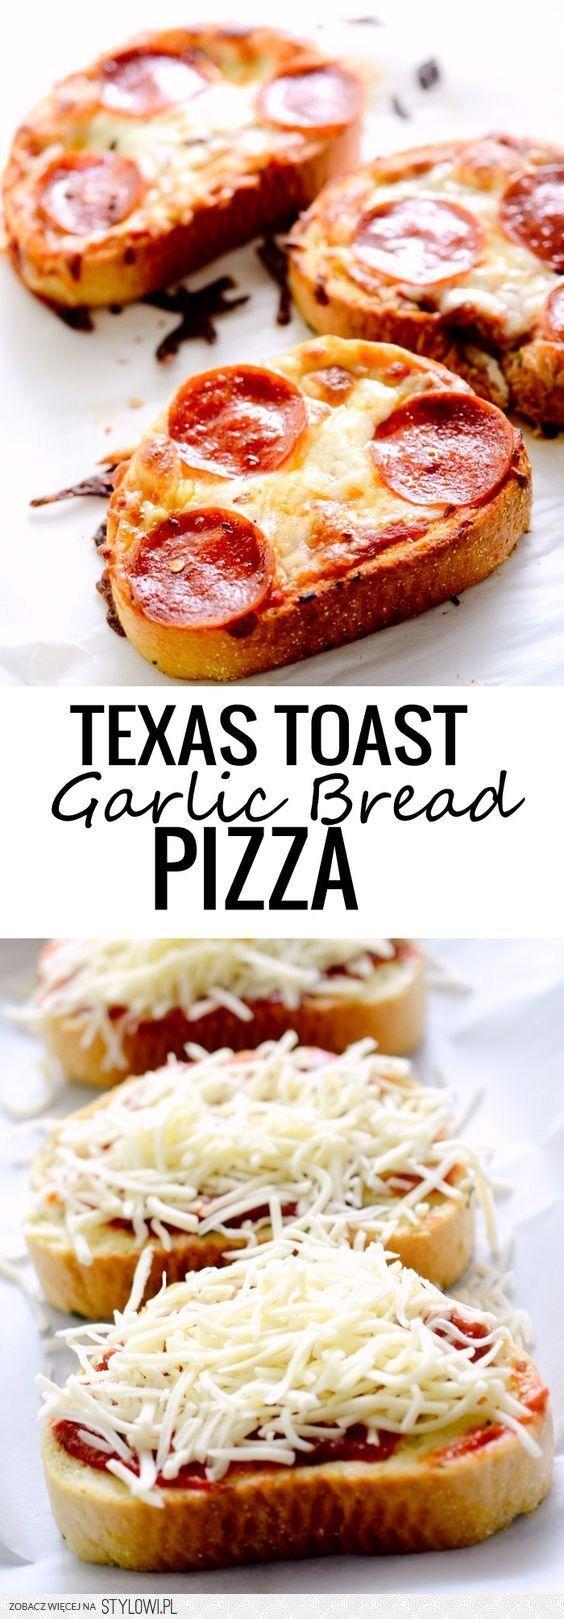 Texas Toast Garlic Bread Pizza Recipe | Buzz Inspired